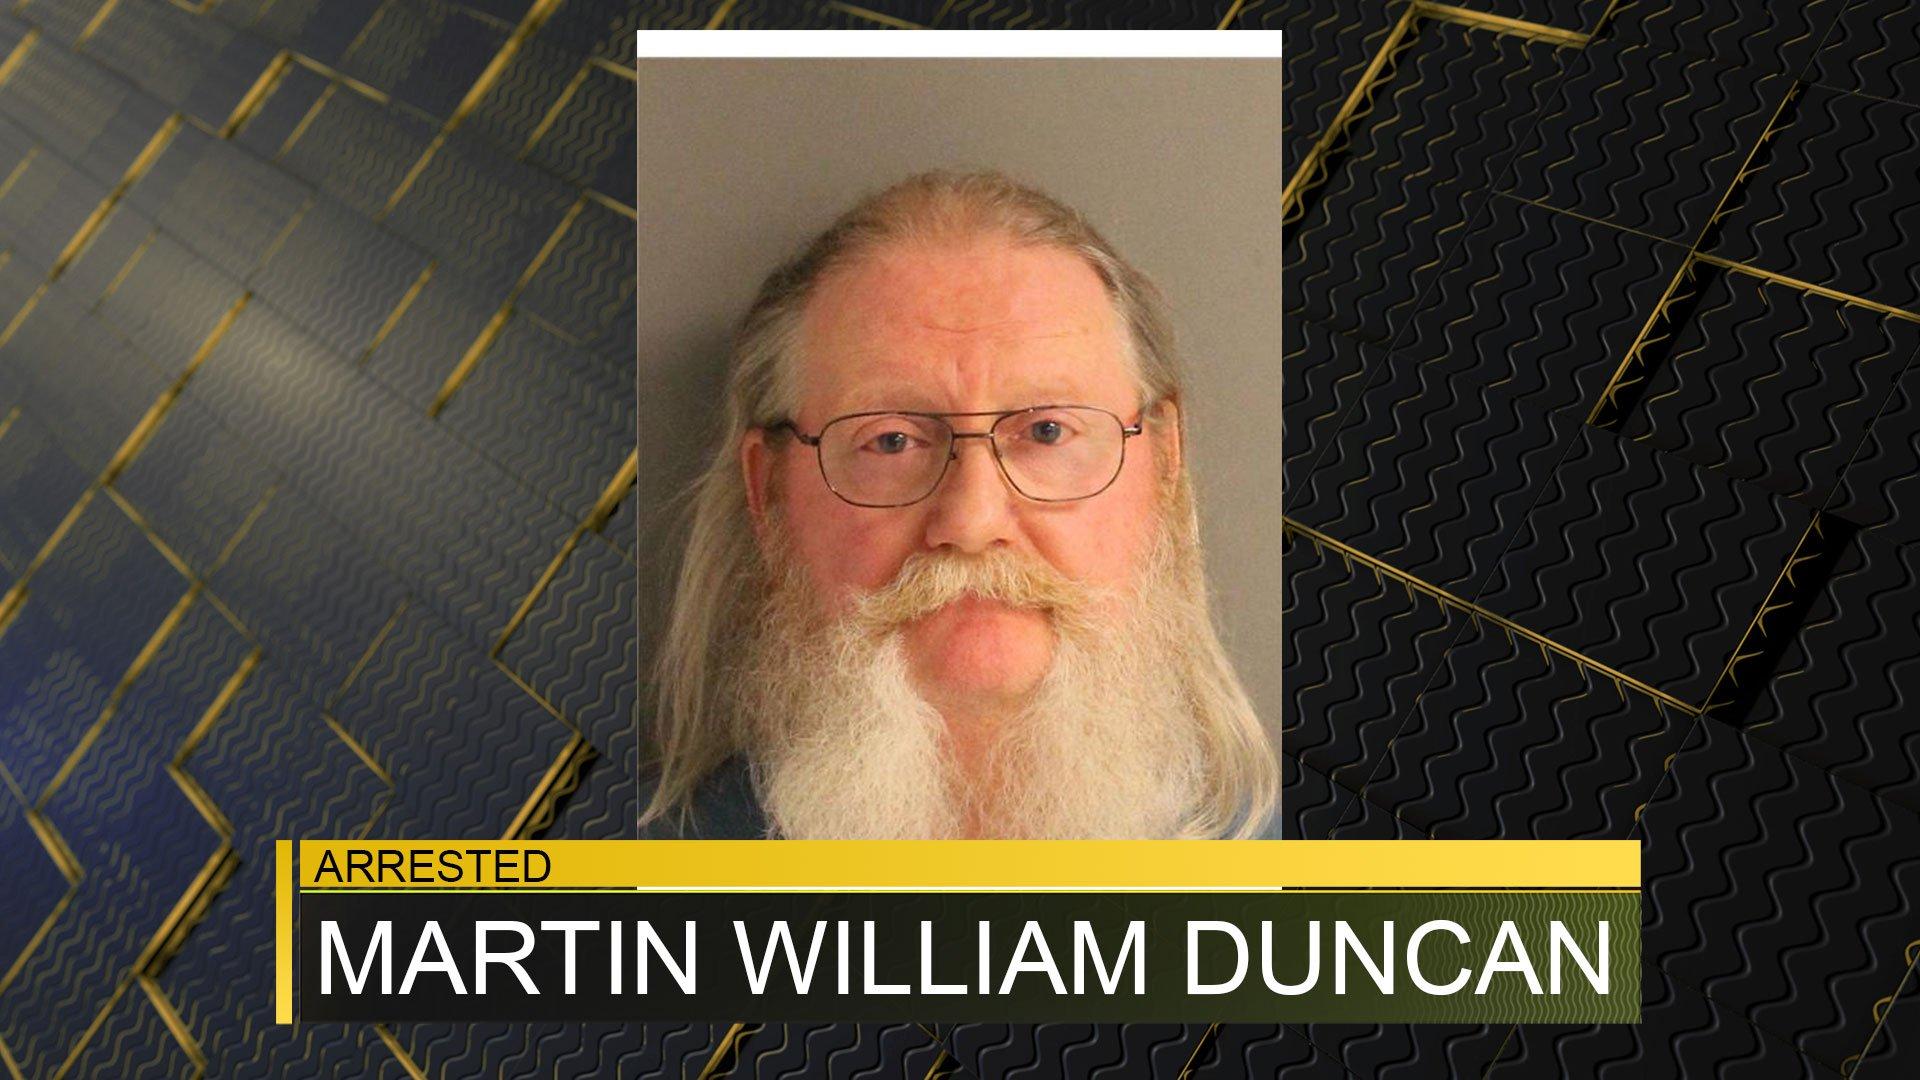 Martin William Duncan (source: Aiken County Detention Center)